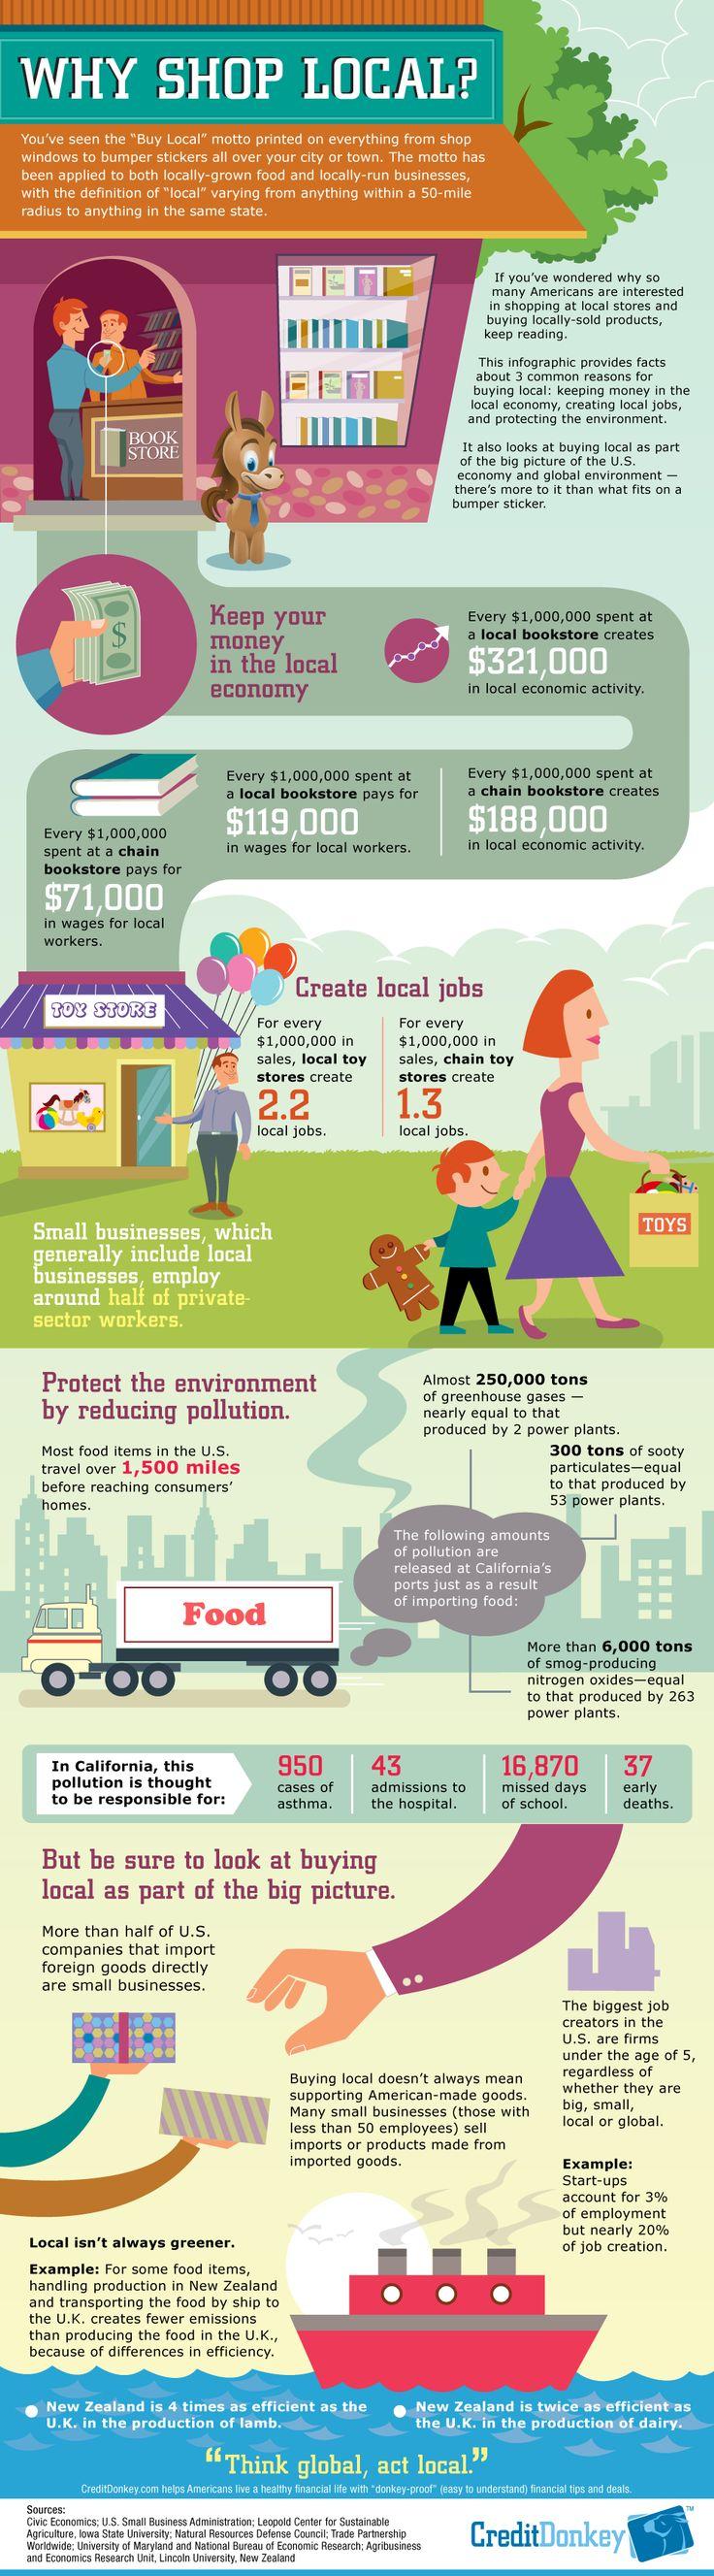 Why Should You Shop Local #Infographics — Lightscap3s.com